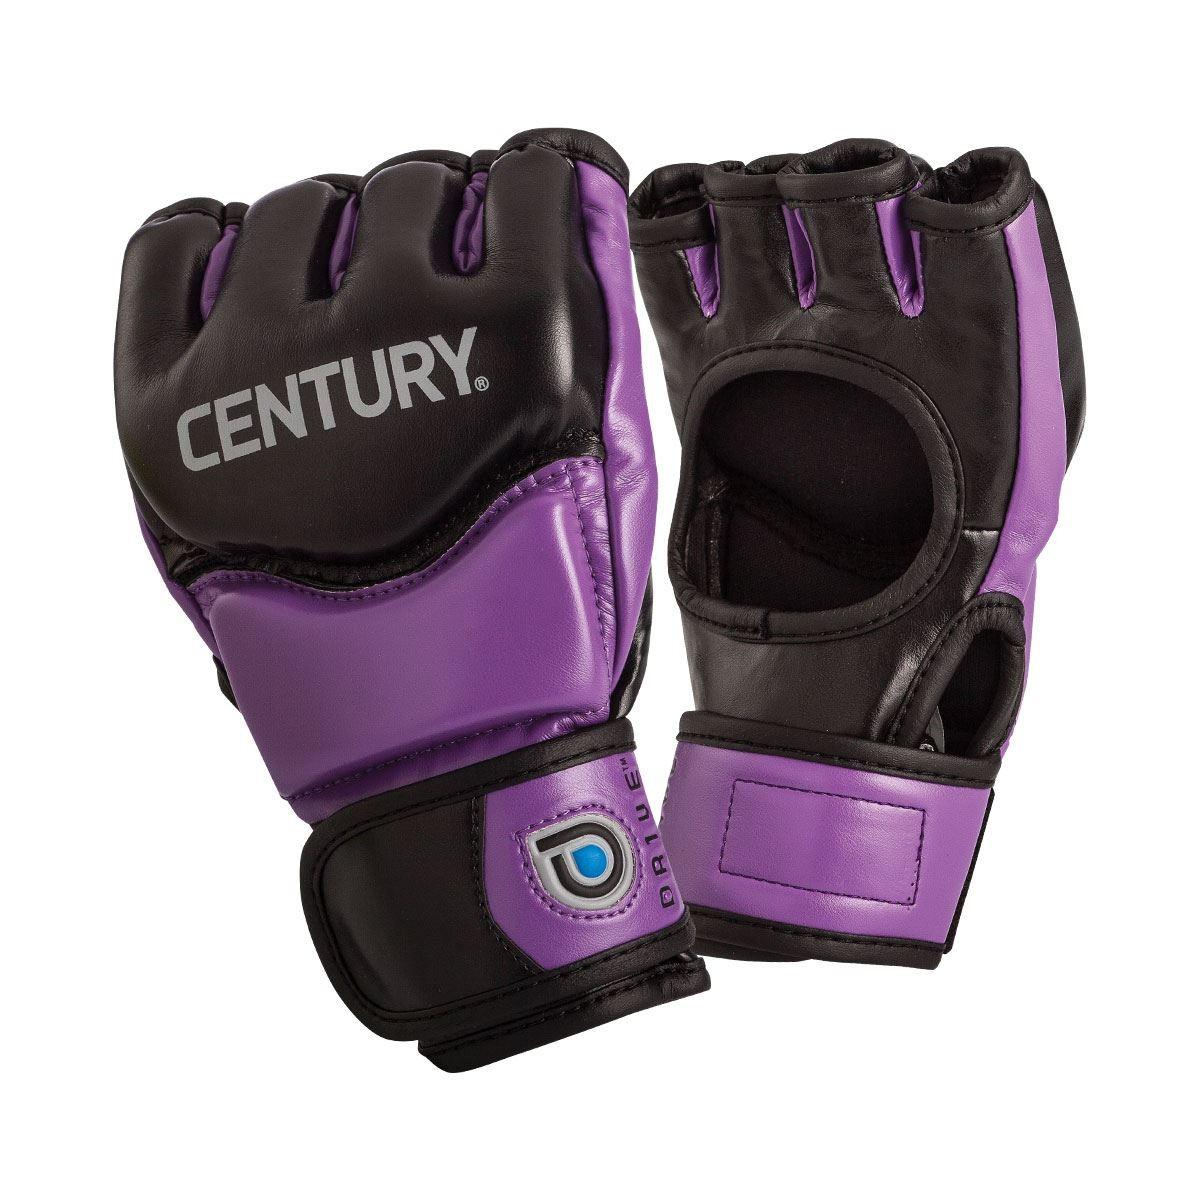 Century Drive Women's MMA Martial Arts Grappling Gloves